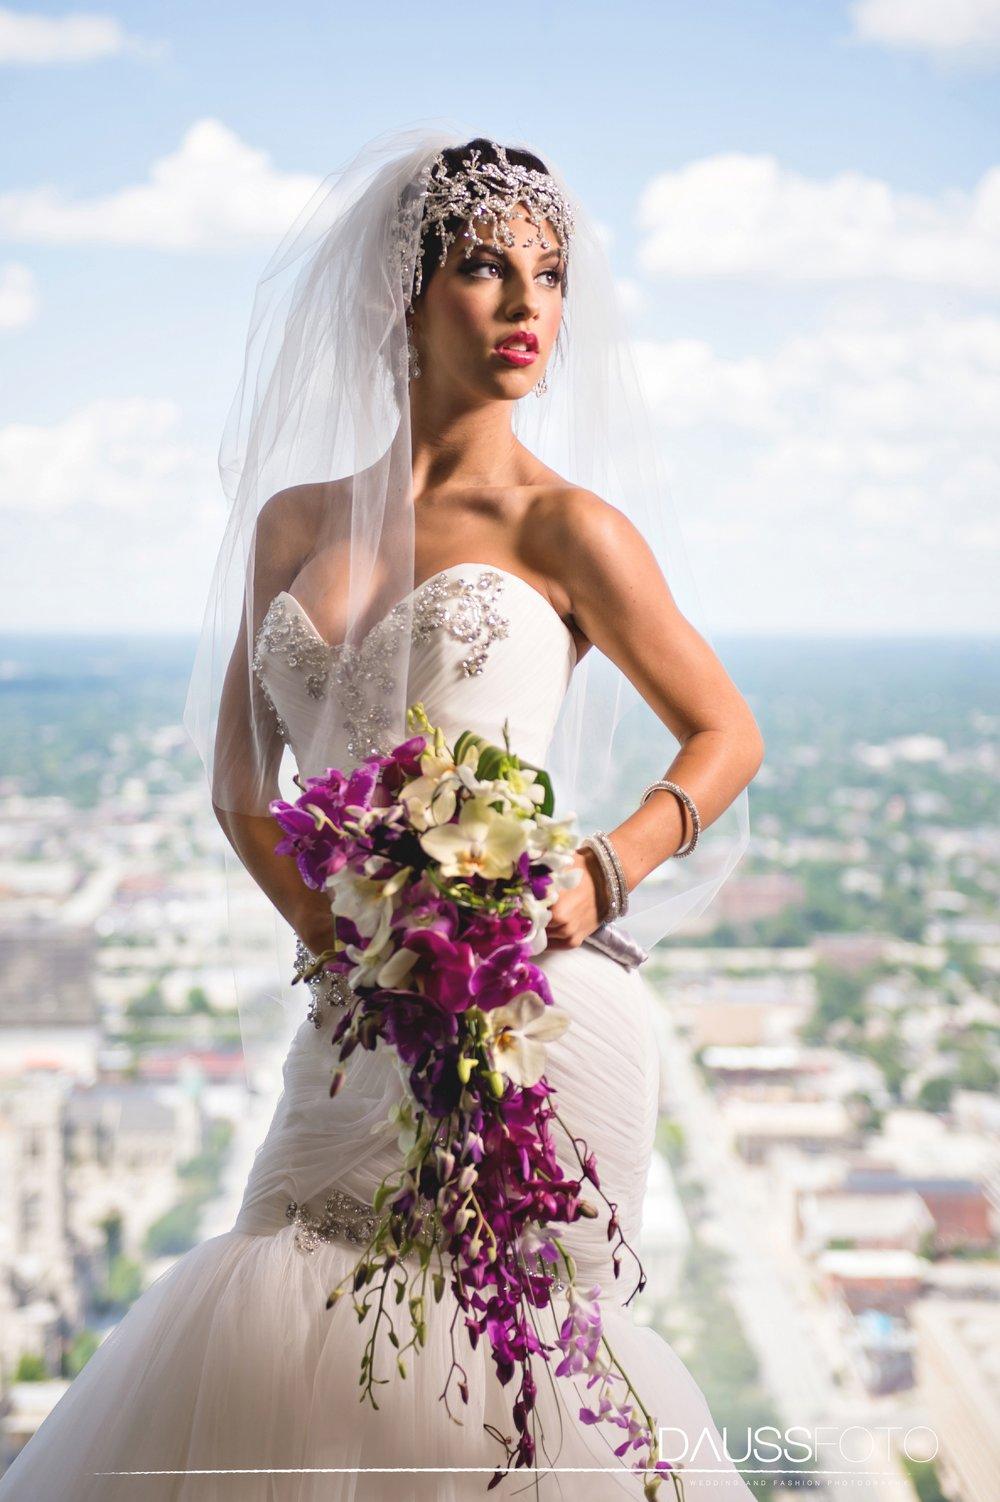 DaussFOTO_20150721_023_Indiana Wedding Photographer.jpg